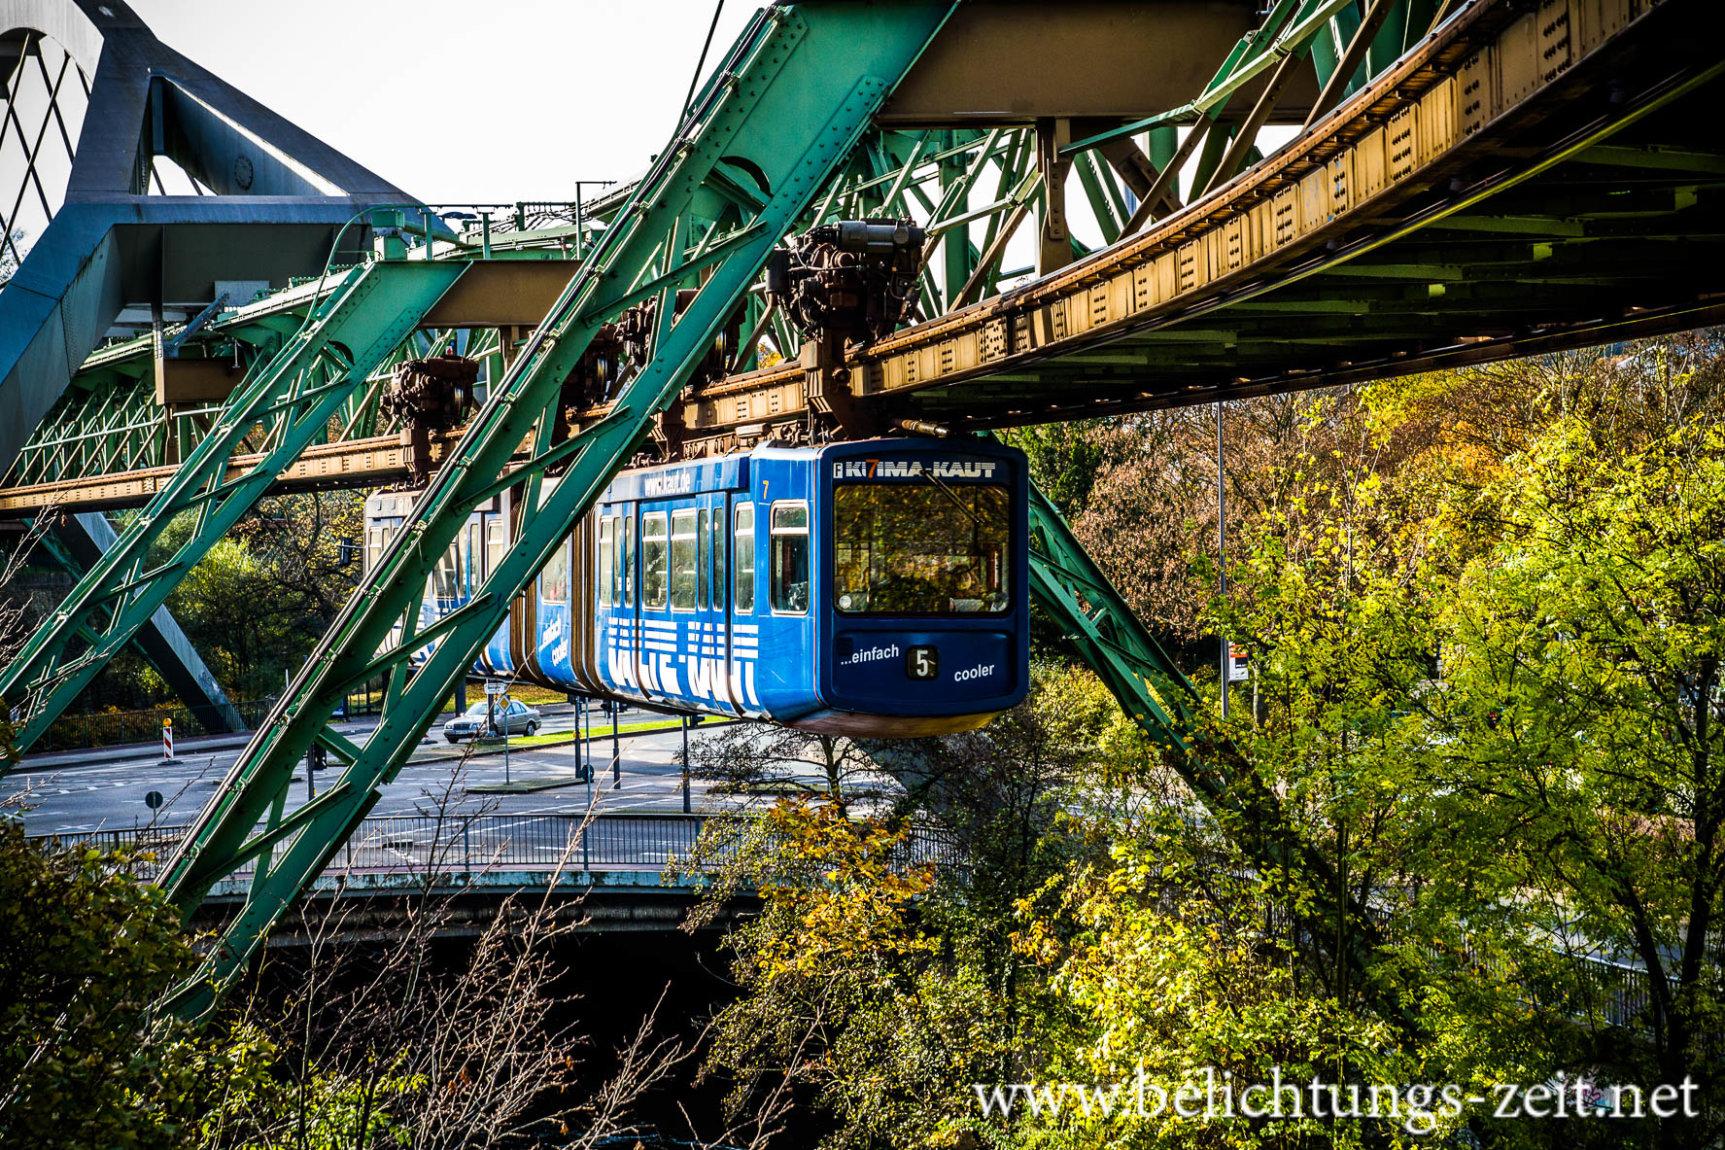 141109-Deutschland-Elberfeld-Wuppertal-134543-2